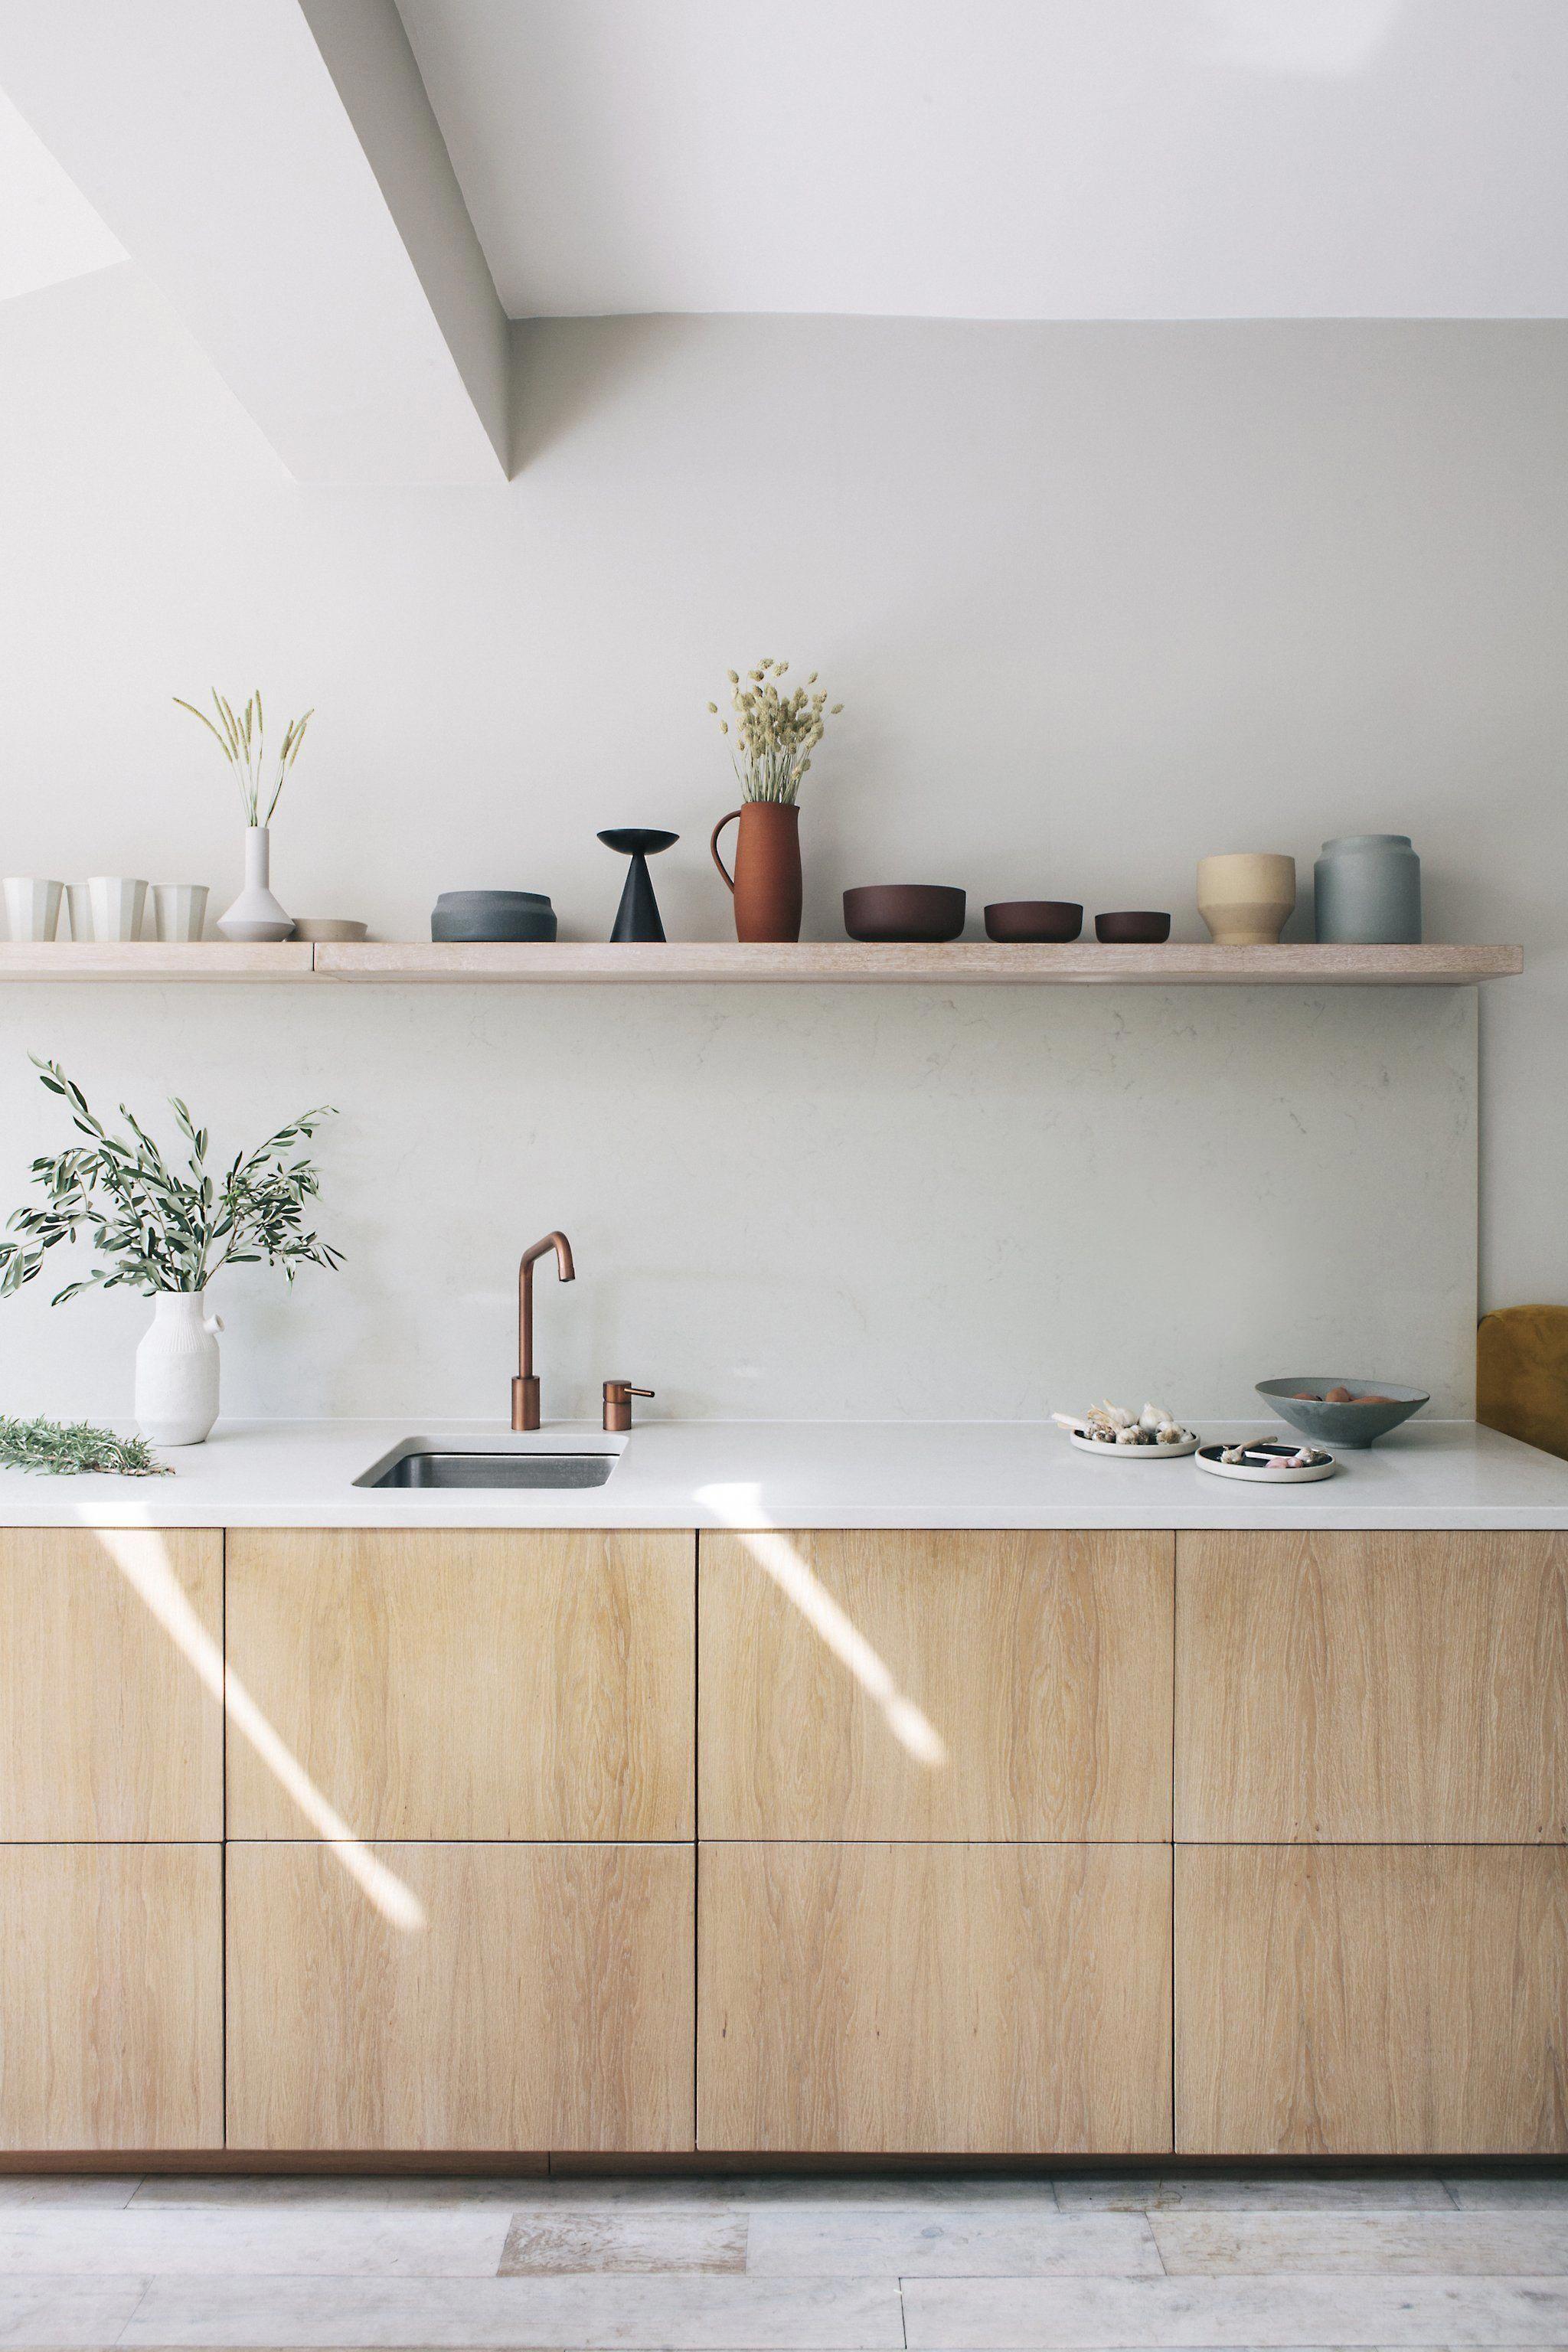 Birch Ply and Hardwood kitchen, wardrobe storage and